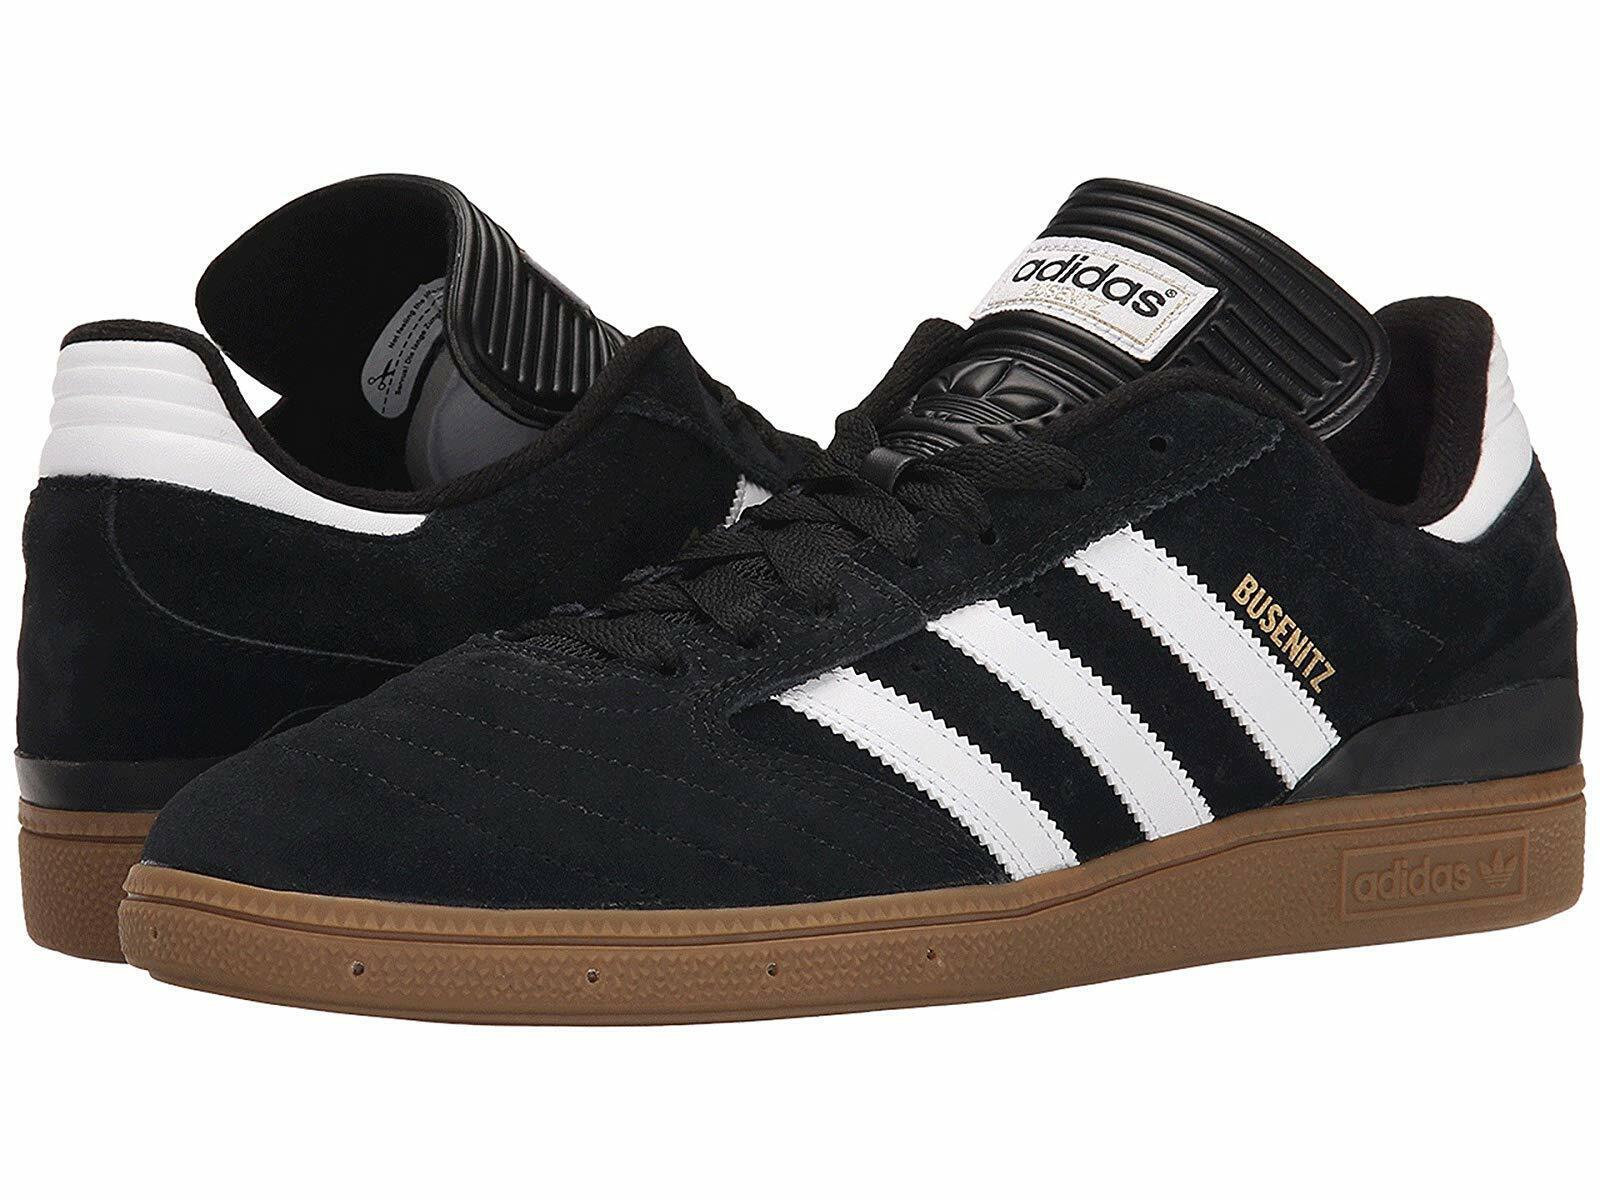 Men's Sneakers & Athletic Shoes adidas Skateboarding Busenitz Pro